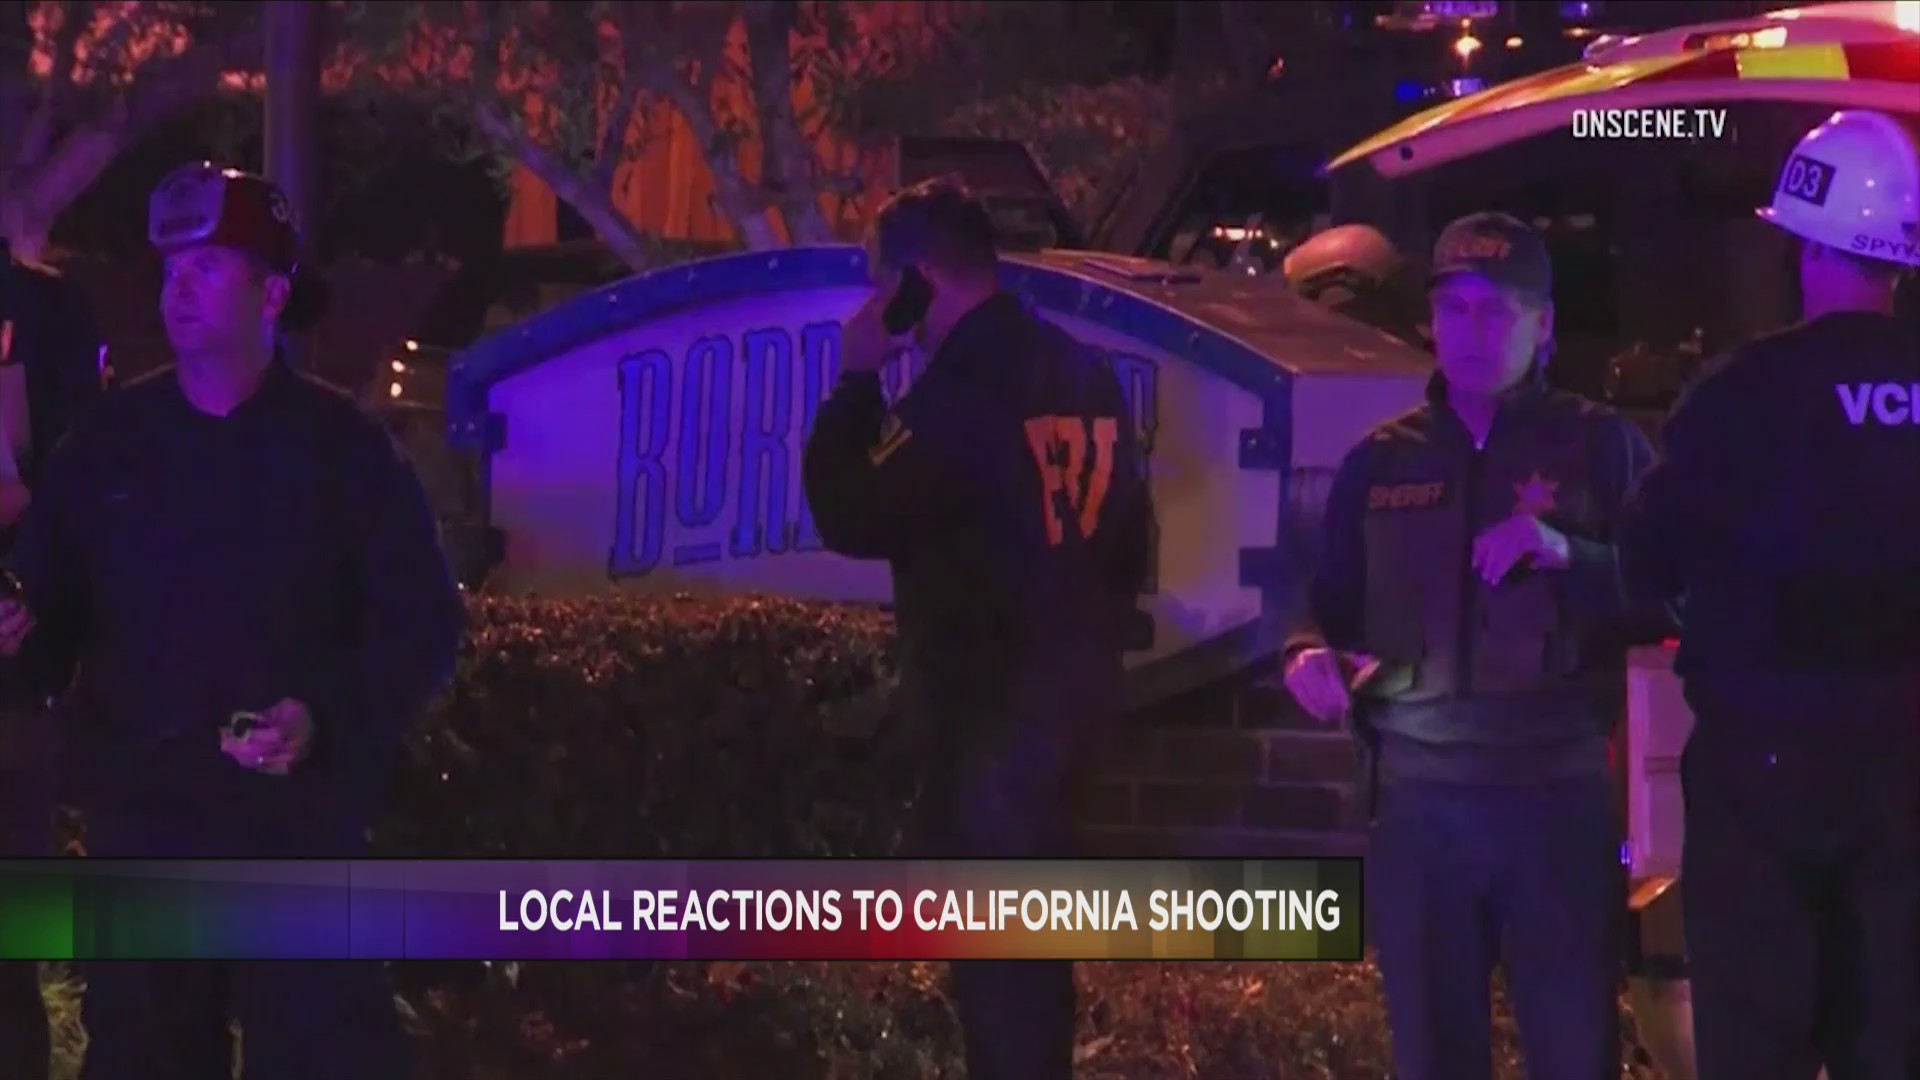 Local_reactions_to_California_shooting_0_20181108231642